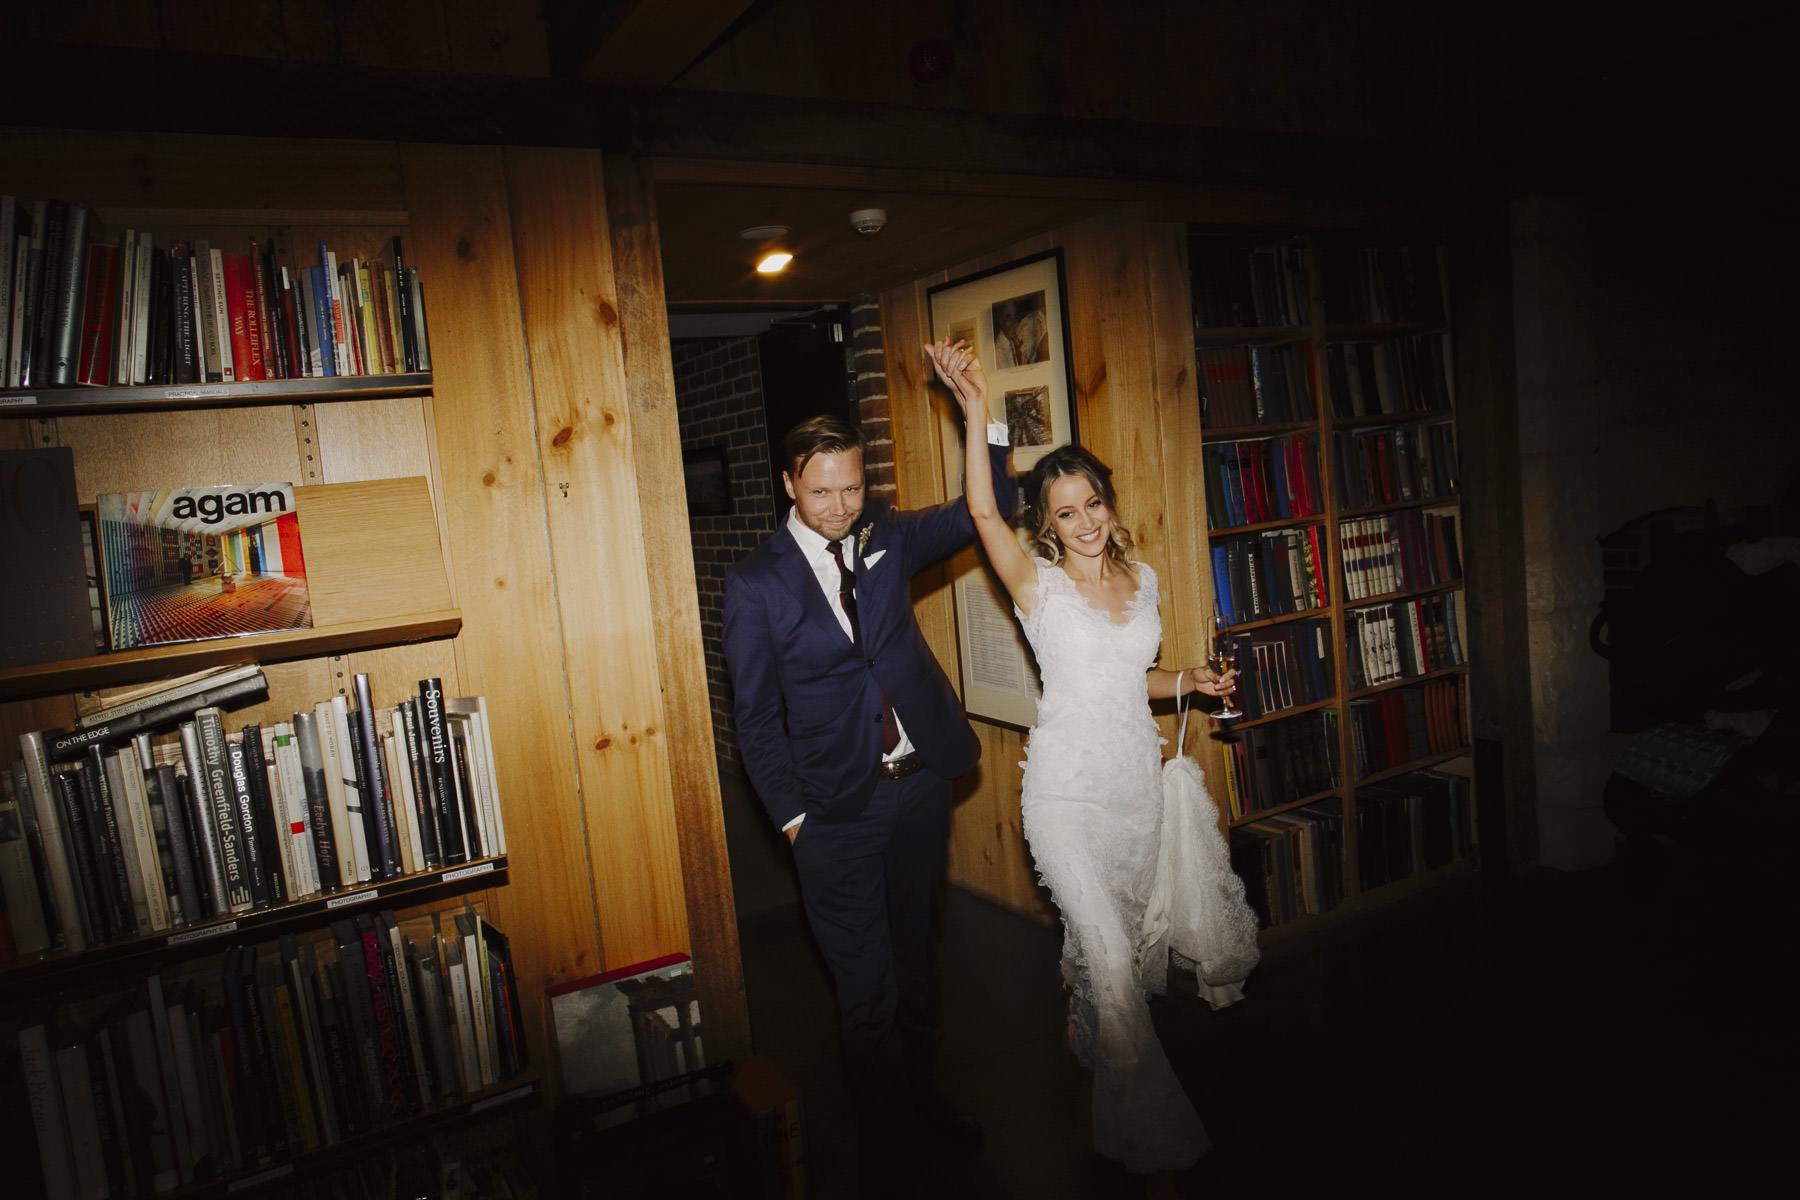 160506_justinaaron_wedding_holly_daniel_pr-247.jpg